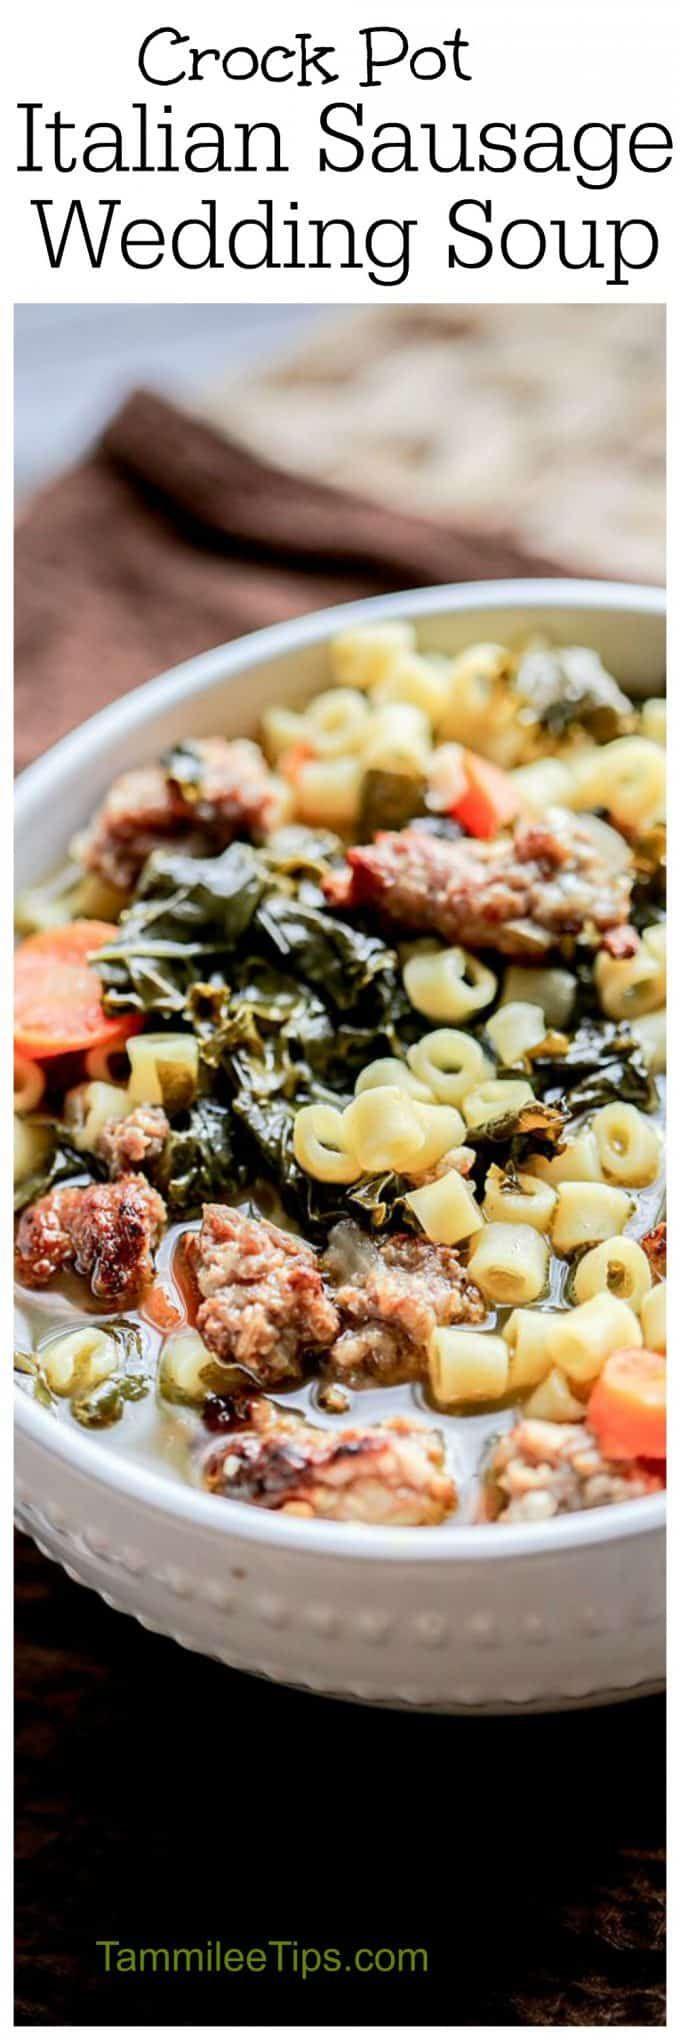 Crock Pot Italian Sausage Wedding Soup Recipe Tammilee